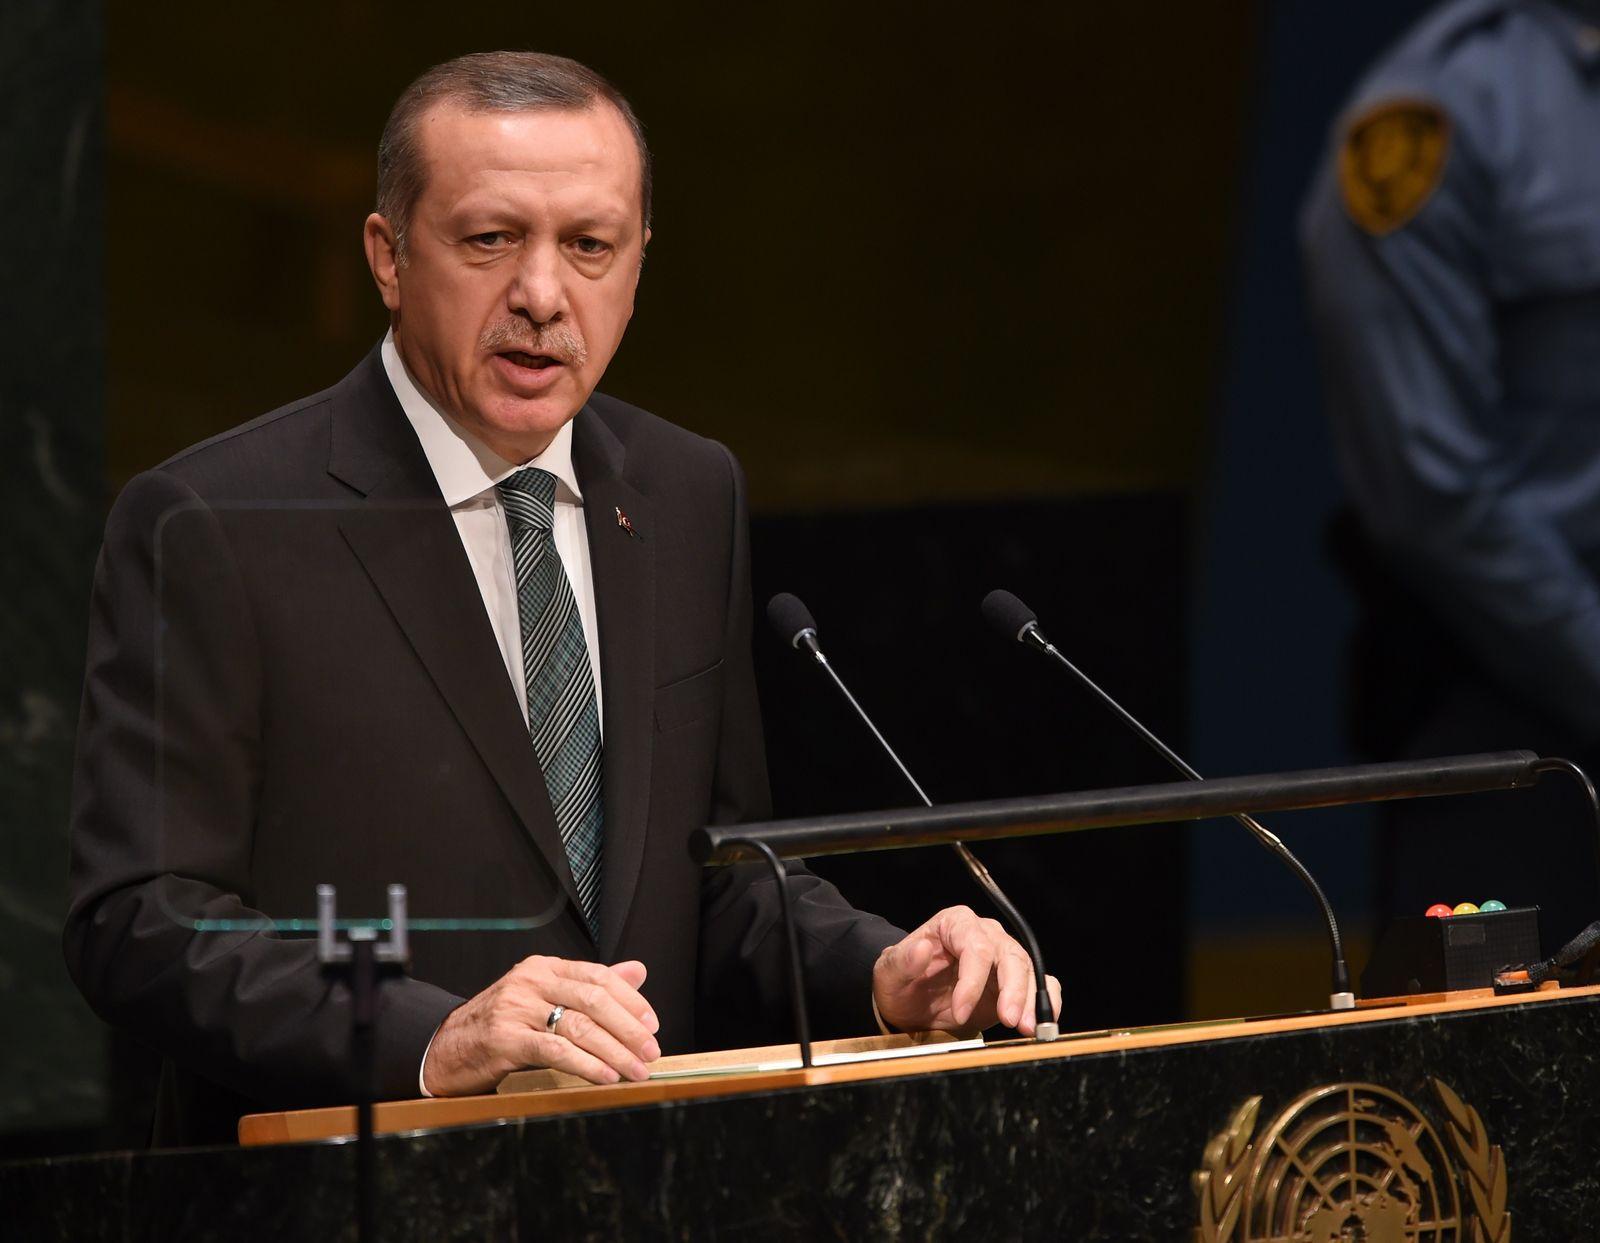 UN-CLIMATE SUMMIT 2014-TURKEY